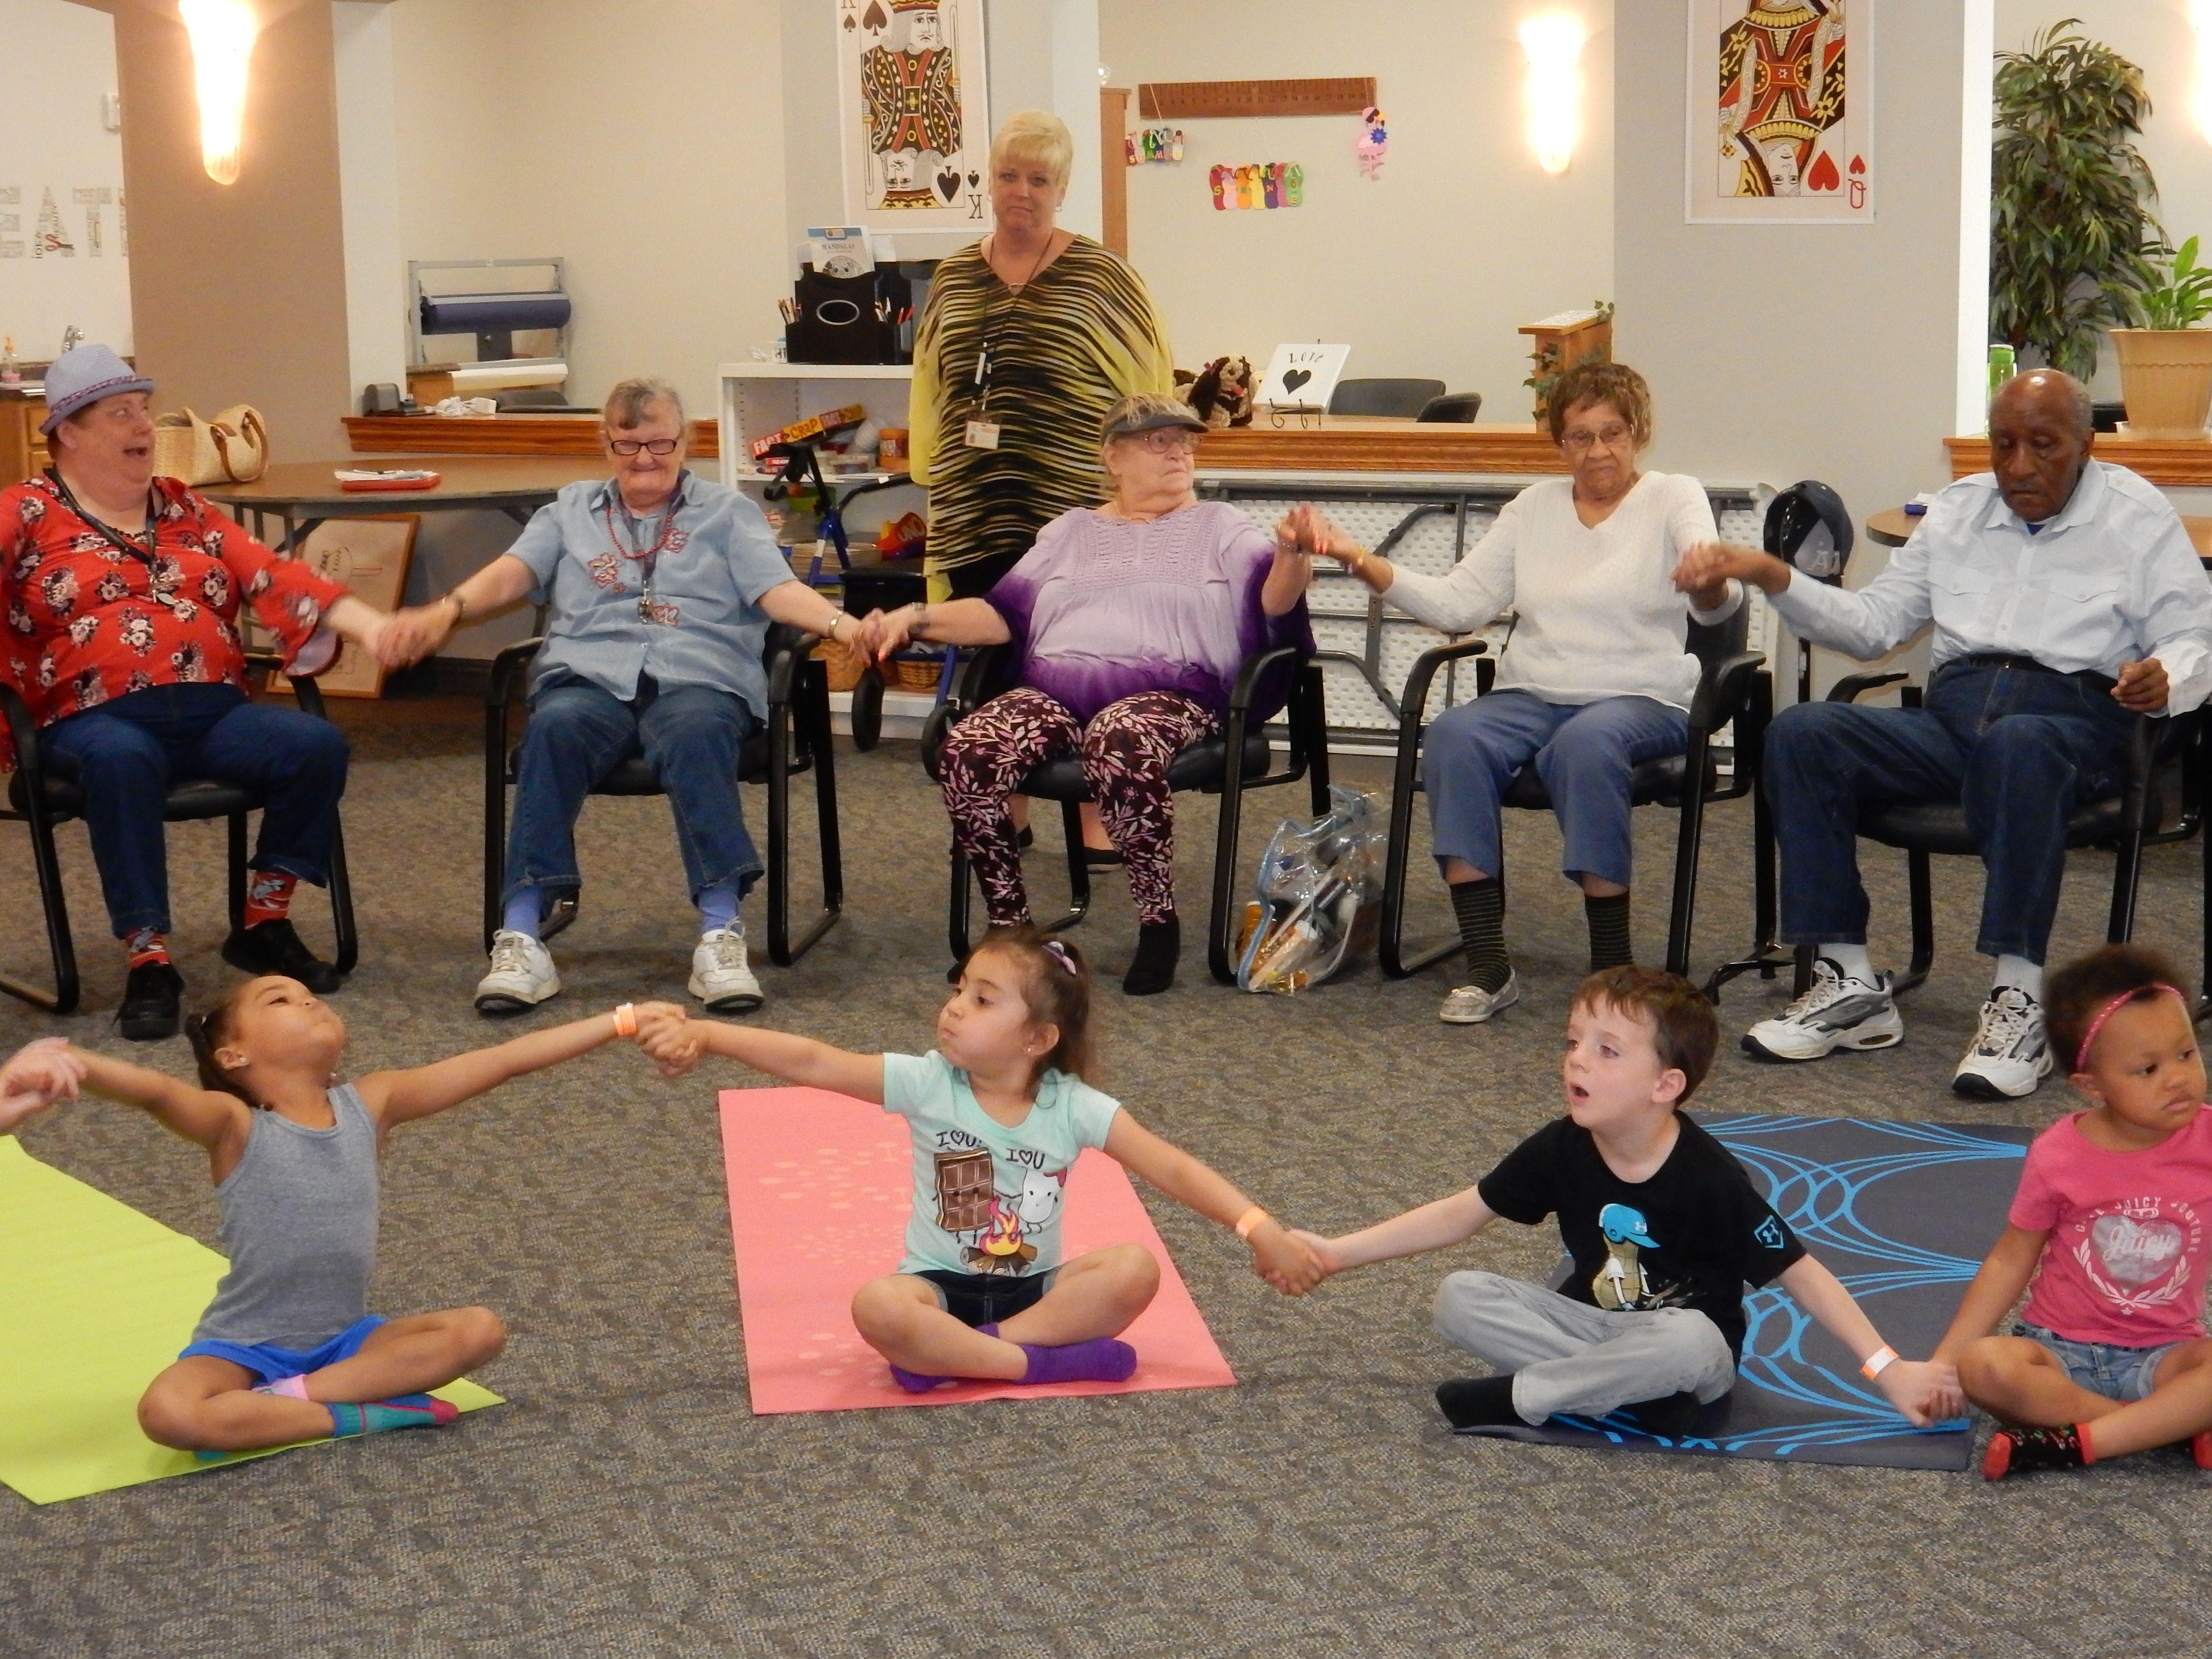 Intergenerational YOGA - Feel the energy!